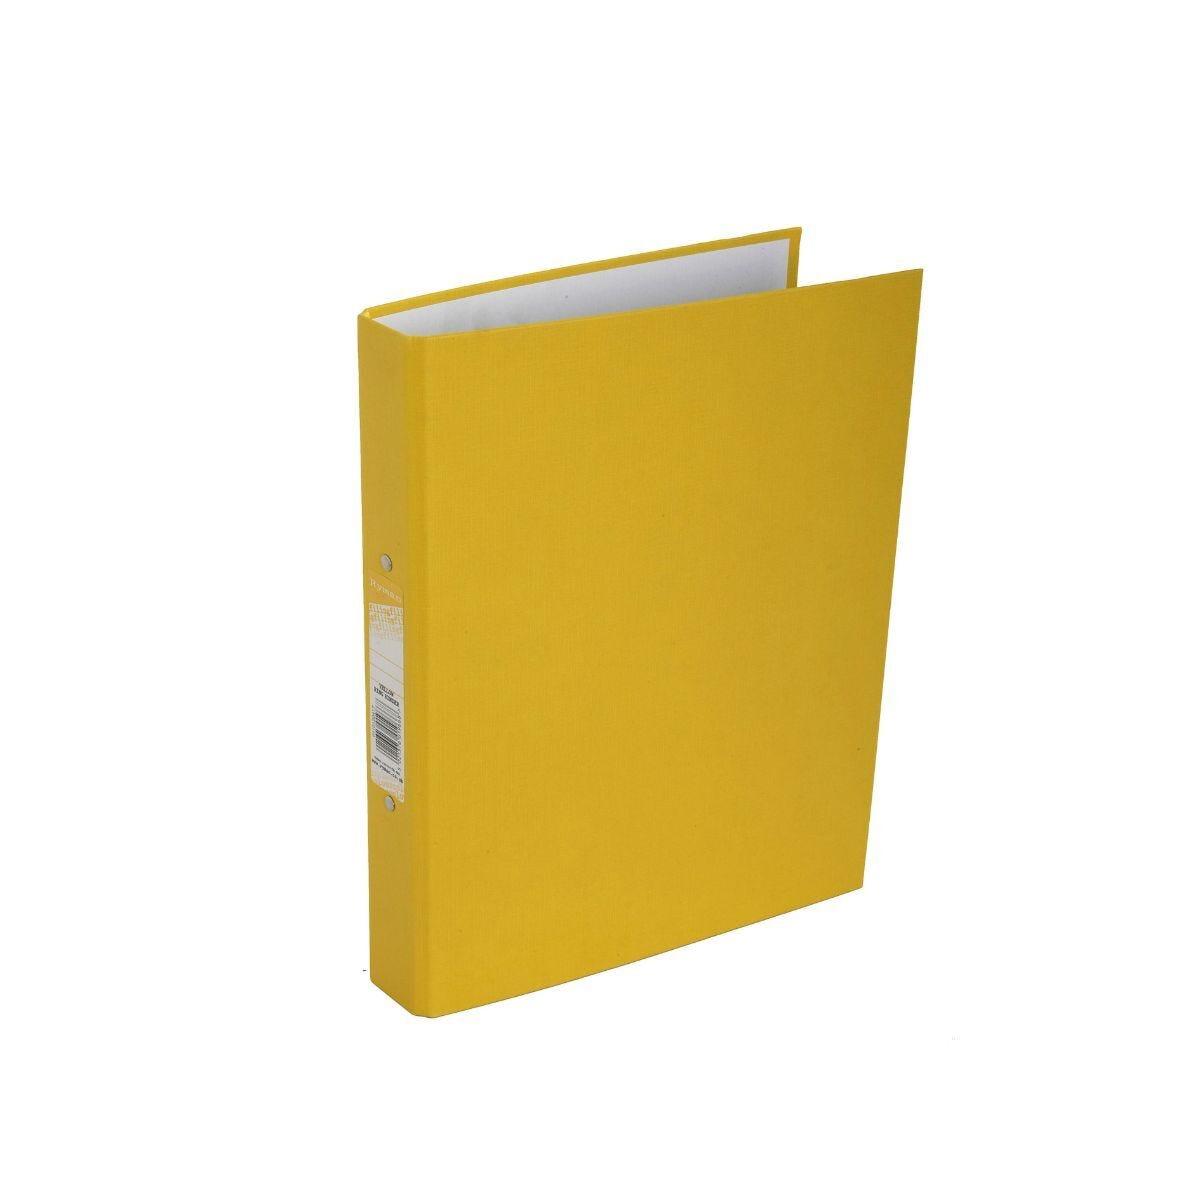 Ryman Colour Ring Binder A4 Yellow